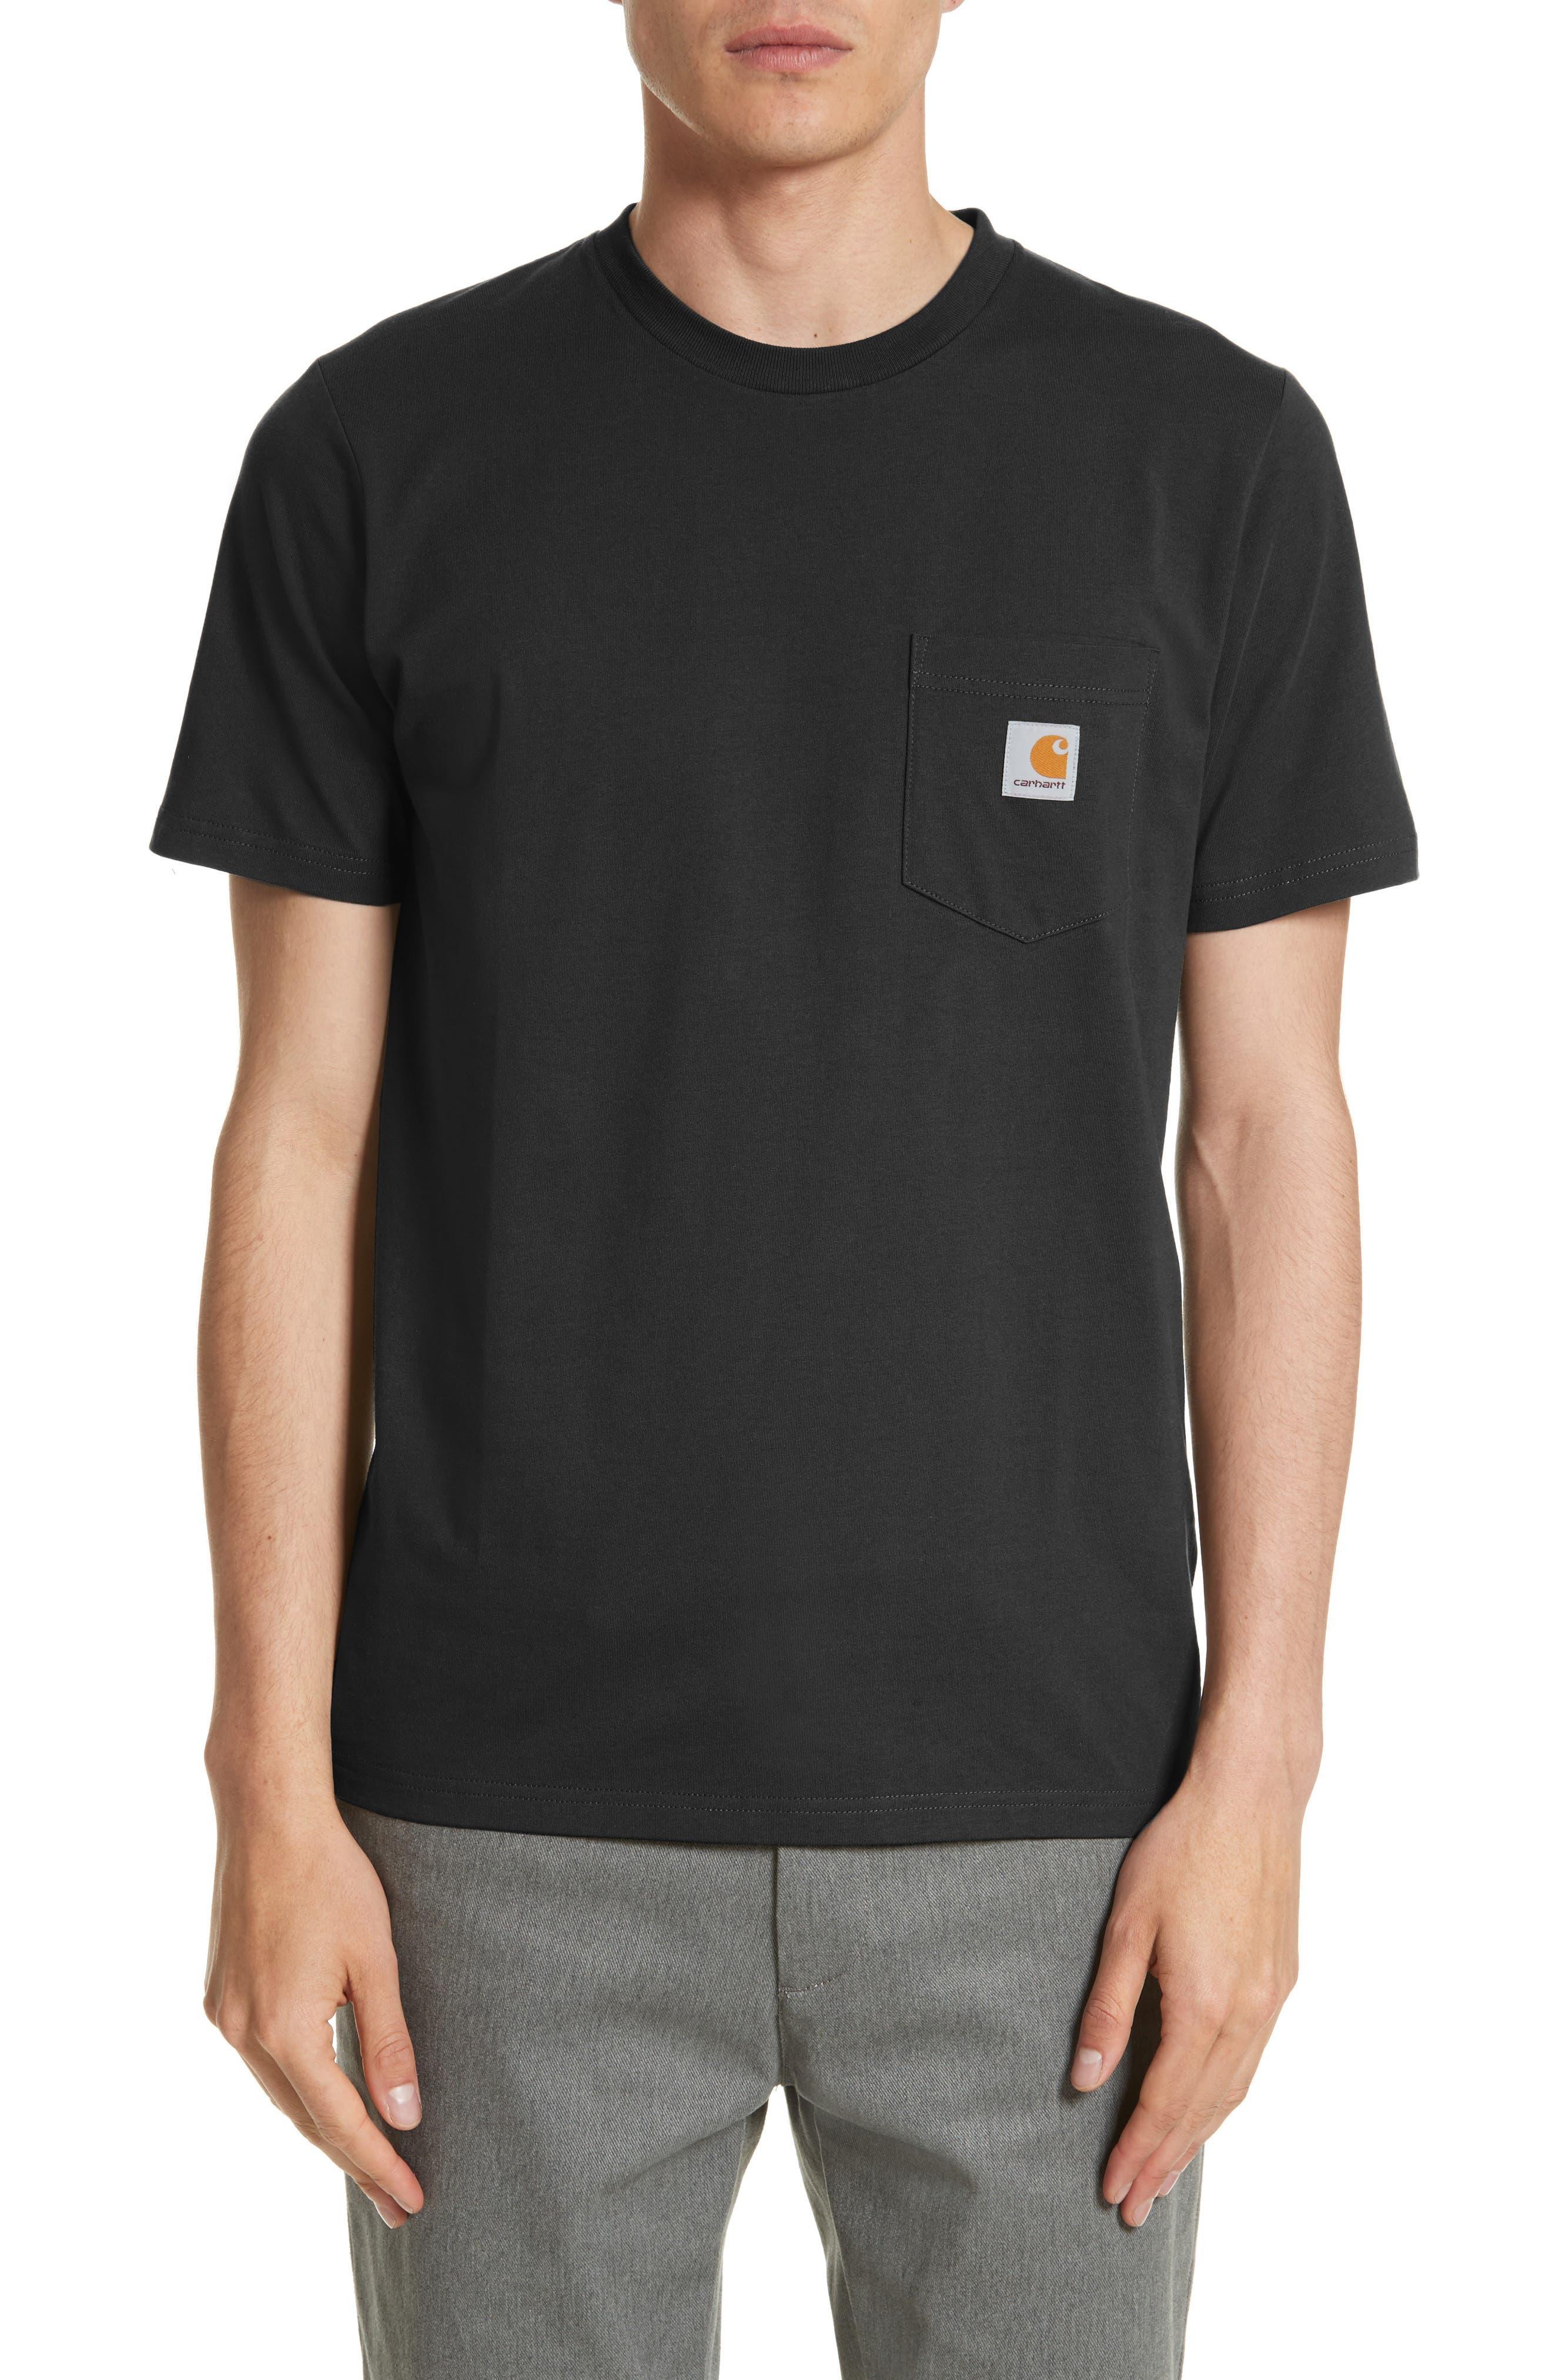 CARHARTT WORK IN PROGRESS Logo Pocket T-Shirt, Main, color, BLACK